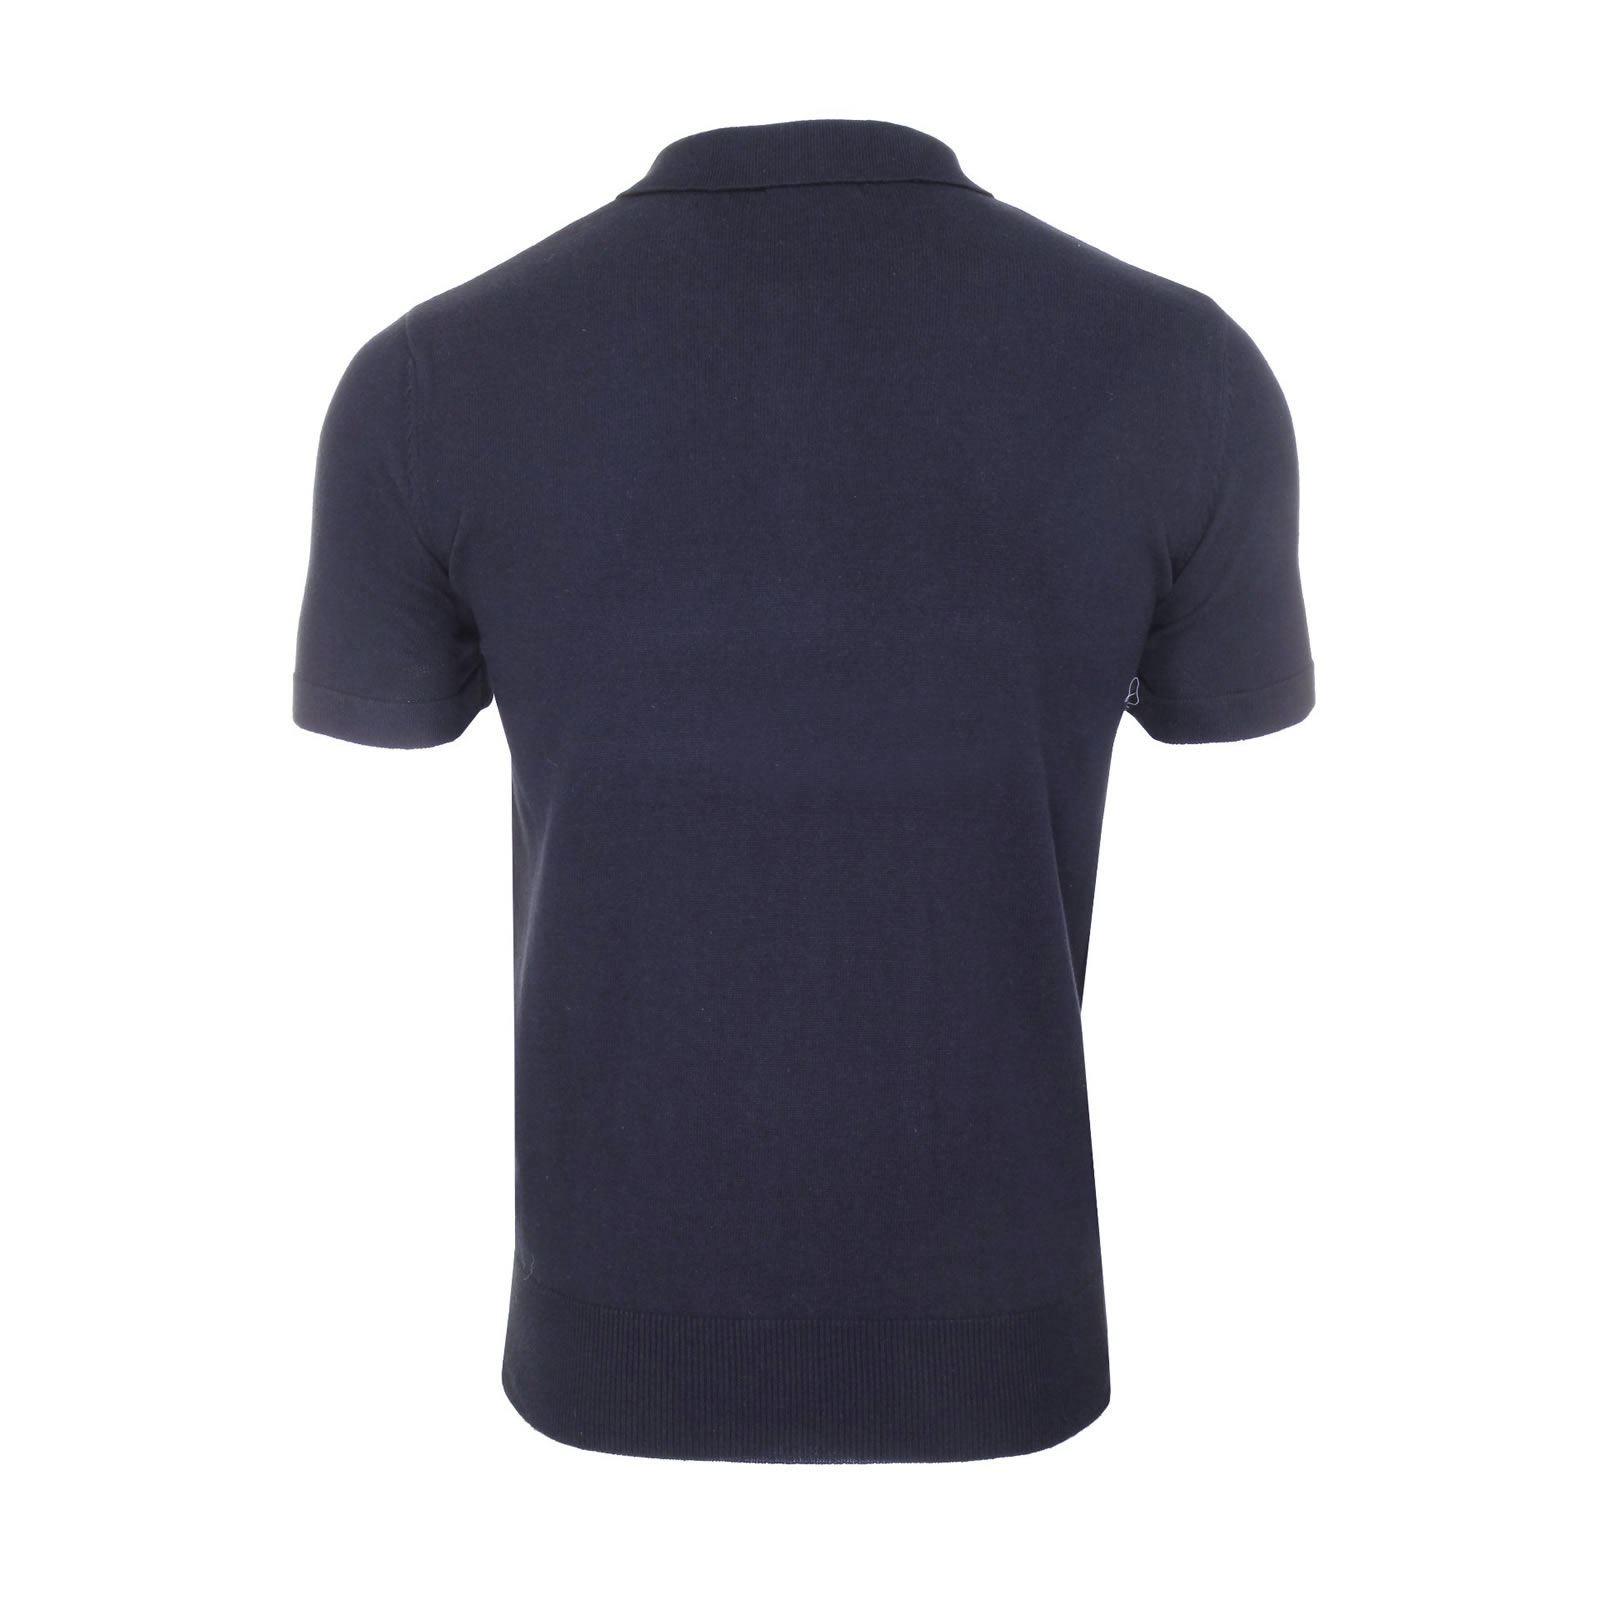 Mens-Knitted-Polo-Brave-Soul-Columbus-Collared-Short-Sleeve-Jumper-T-Shirt thumbnail 13